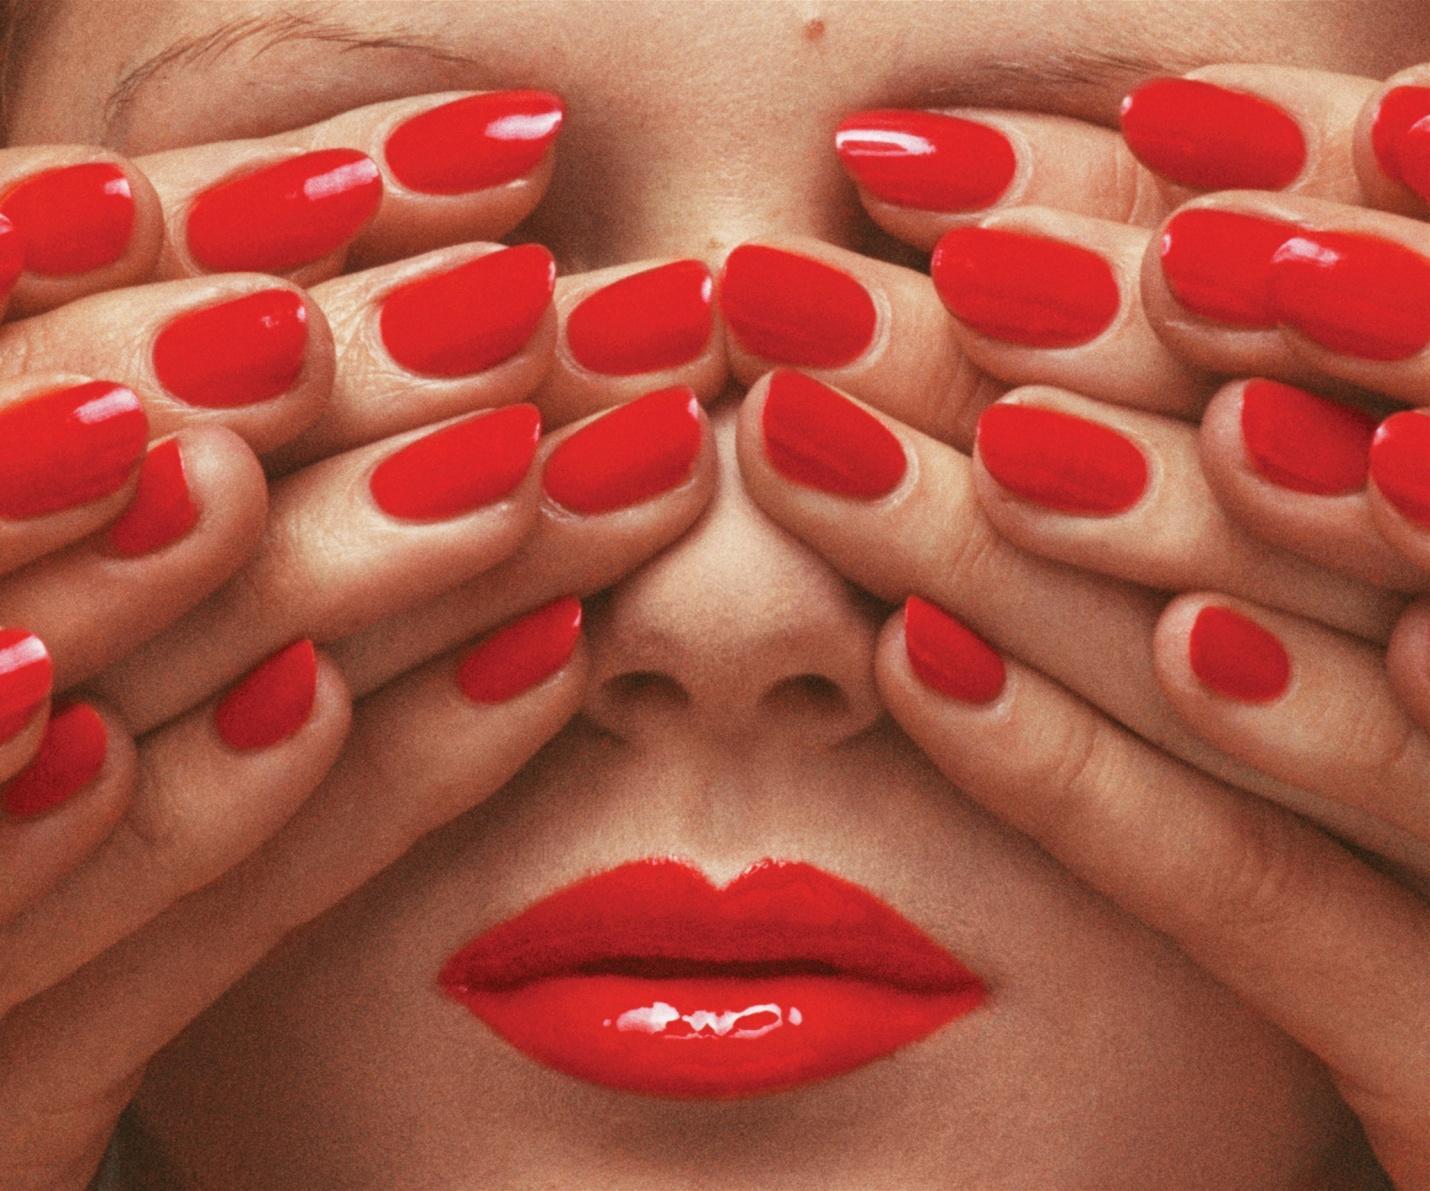 The biggest Guy Bourdin retrospective to date hits the UK this weekend: http://t.co/XU2bqE3CV9 http://t.co/BeH7DZj9Dw